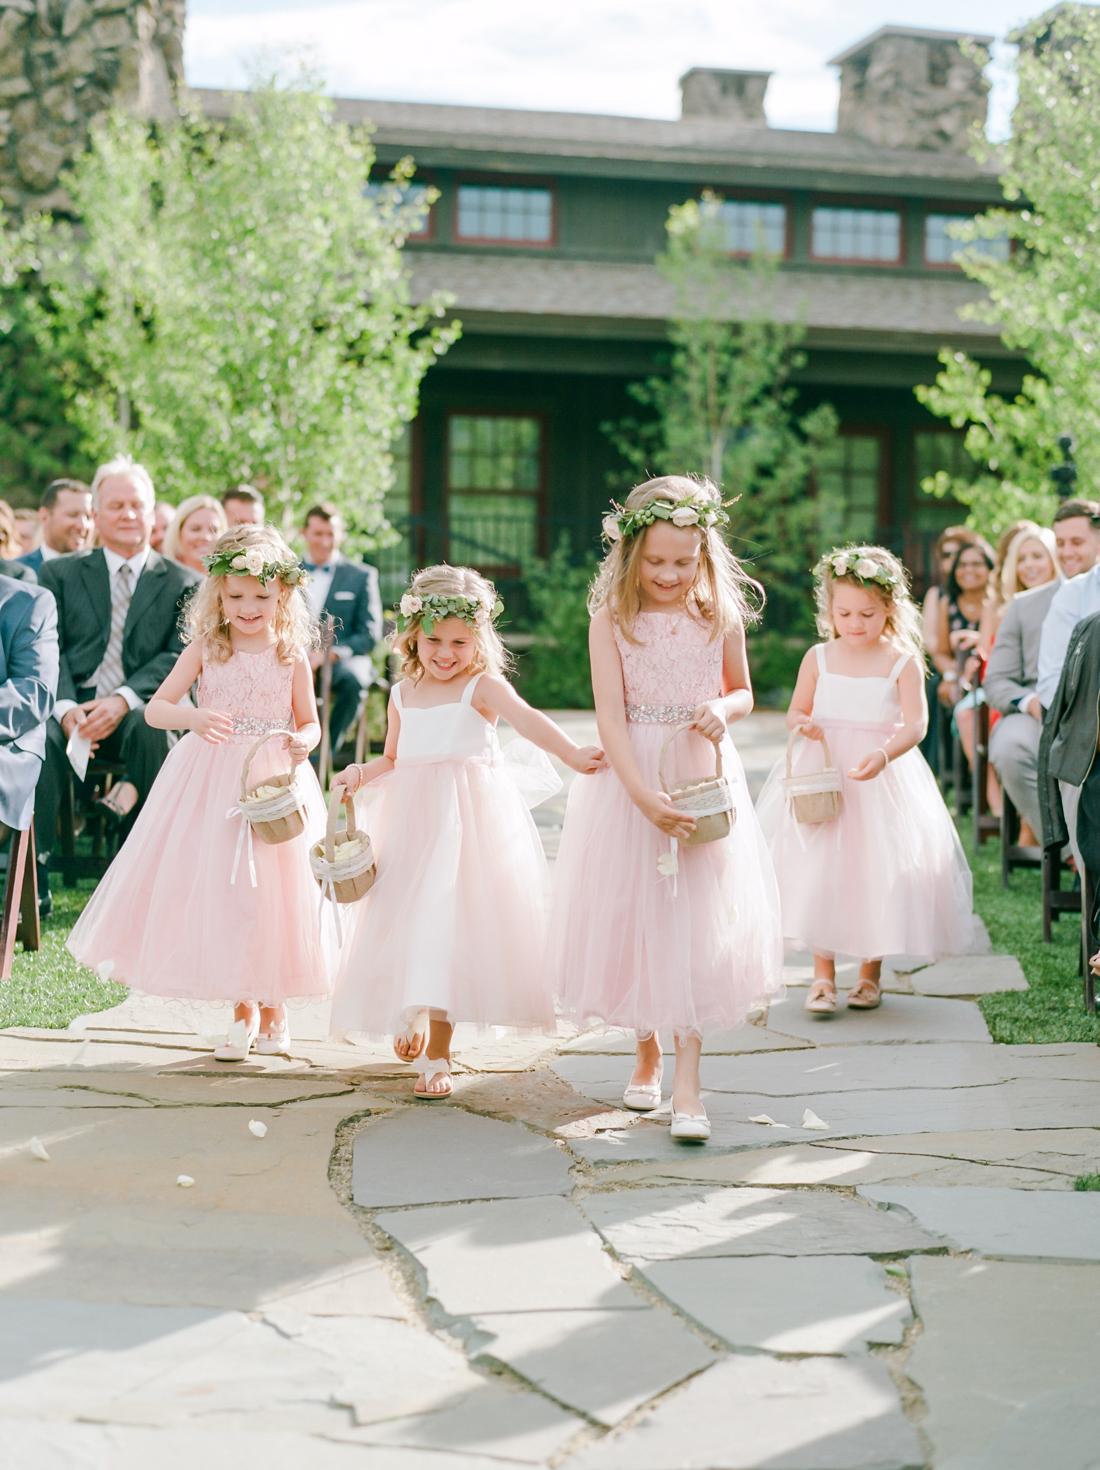 Little White Dress Bridal Shop, Denver Bridal Gown Shop, Denver Wedding Dress, Denver Wedding Alterations, Galia Lahav Colorado, Devil's Thumb Ranch, Denver Galia Lahav